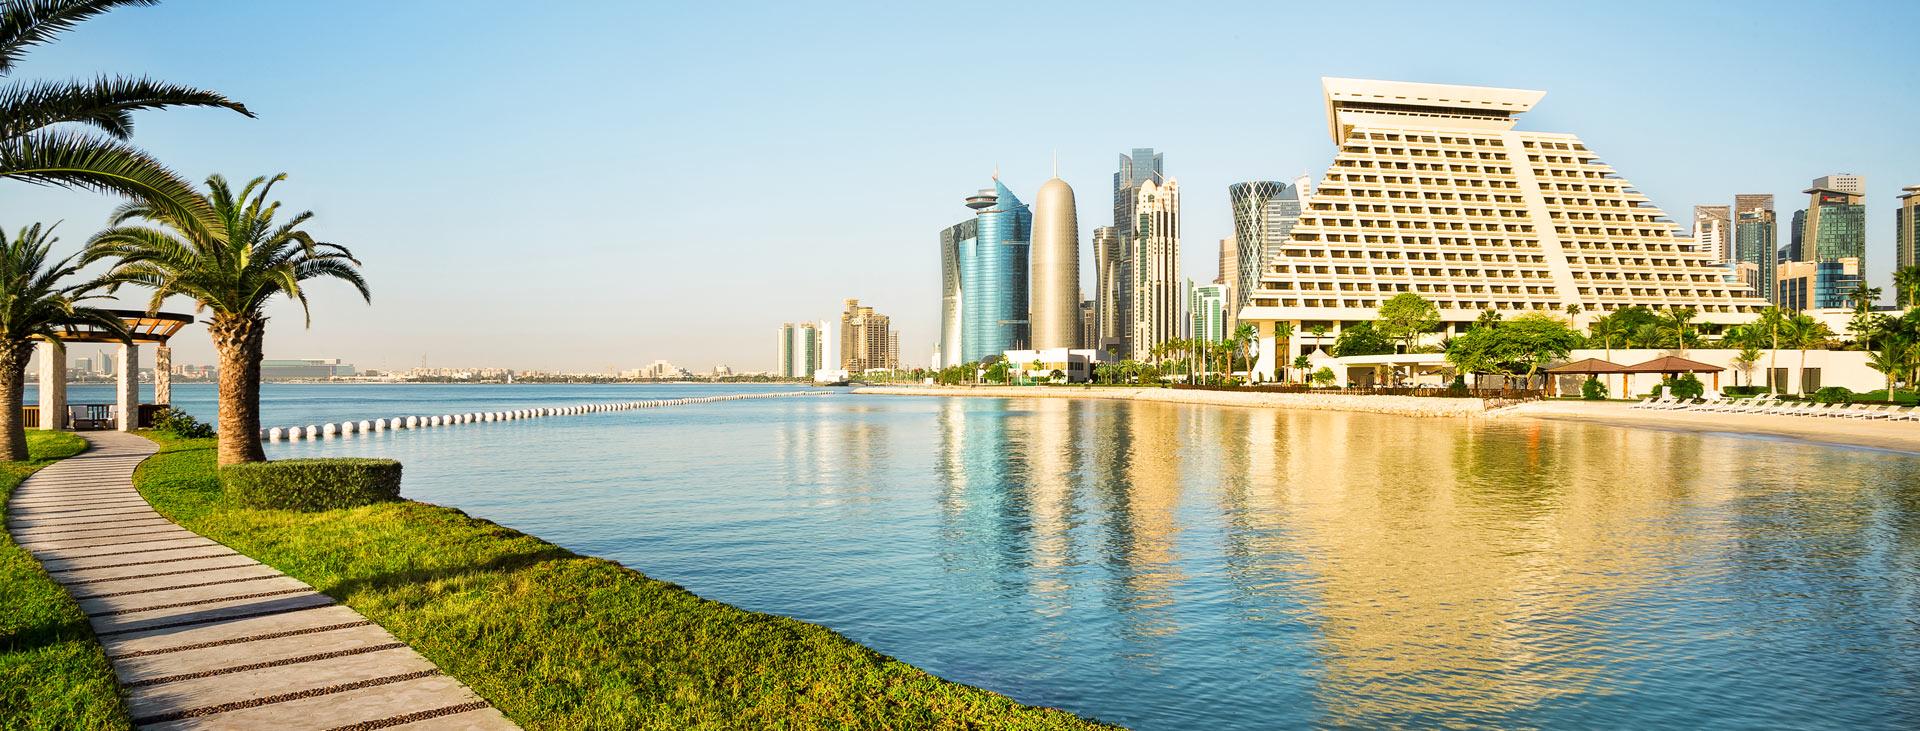 Sheraton Grand Doha Resort & Convention Hotel, Doha, Qatar